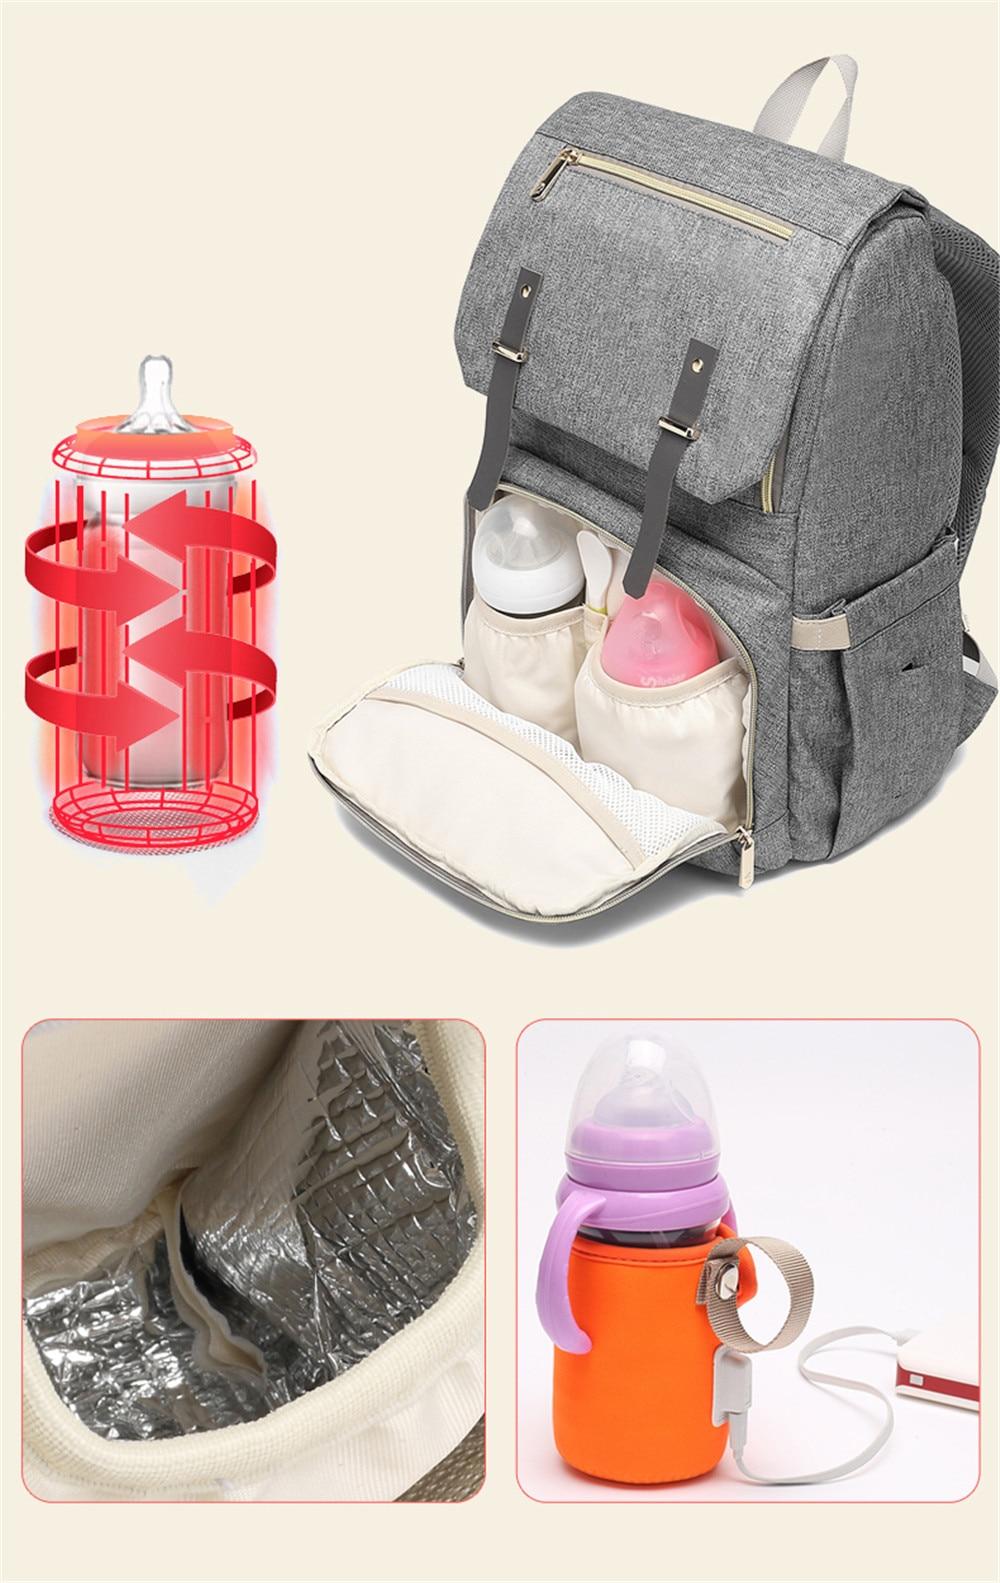 HTB1jDsnao rK1Rjy0Fcq6zEvVXaP Fashion Large Capacity Baby Nappy Bag Diaper Bag Purse Multifunction USB Mummy Travel Backpack Women Nursing Bags For Mom Daddy